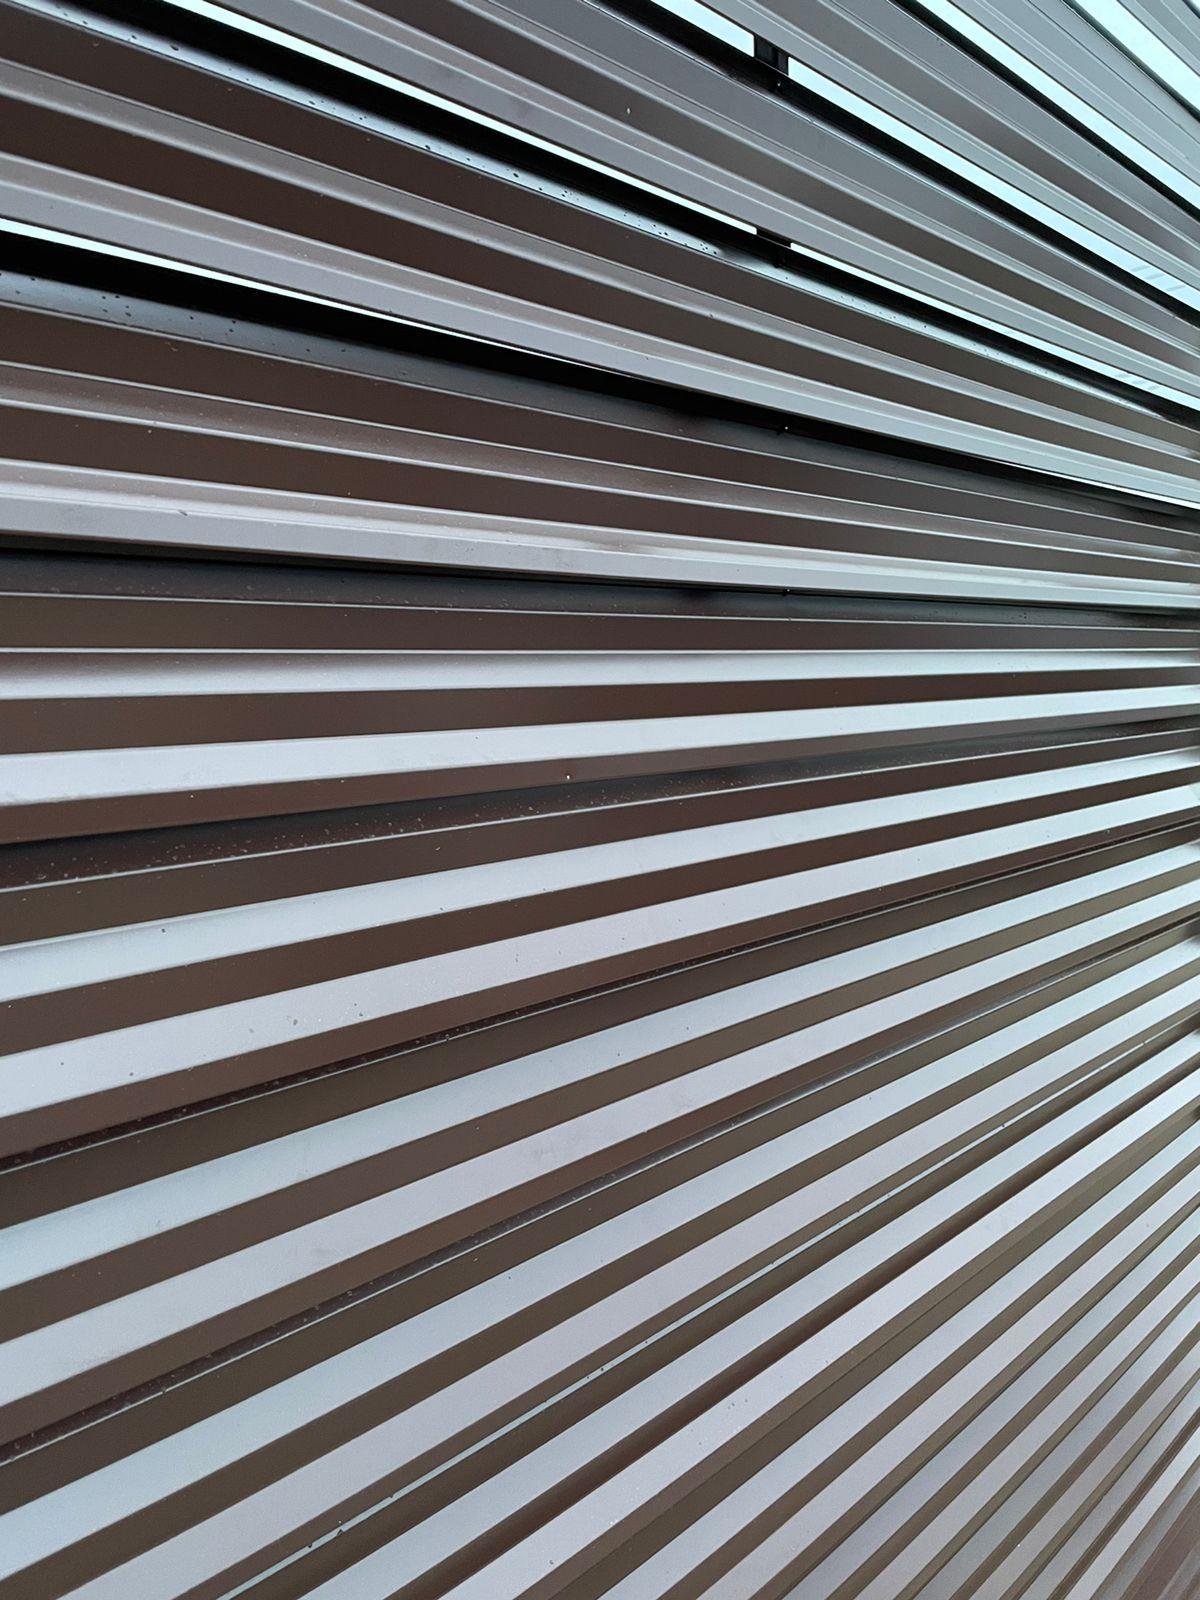 забор-жалюзи с ламелями Елочка шоколад фото8